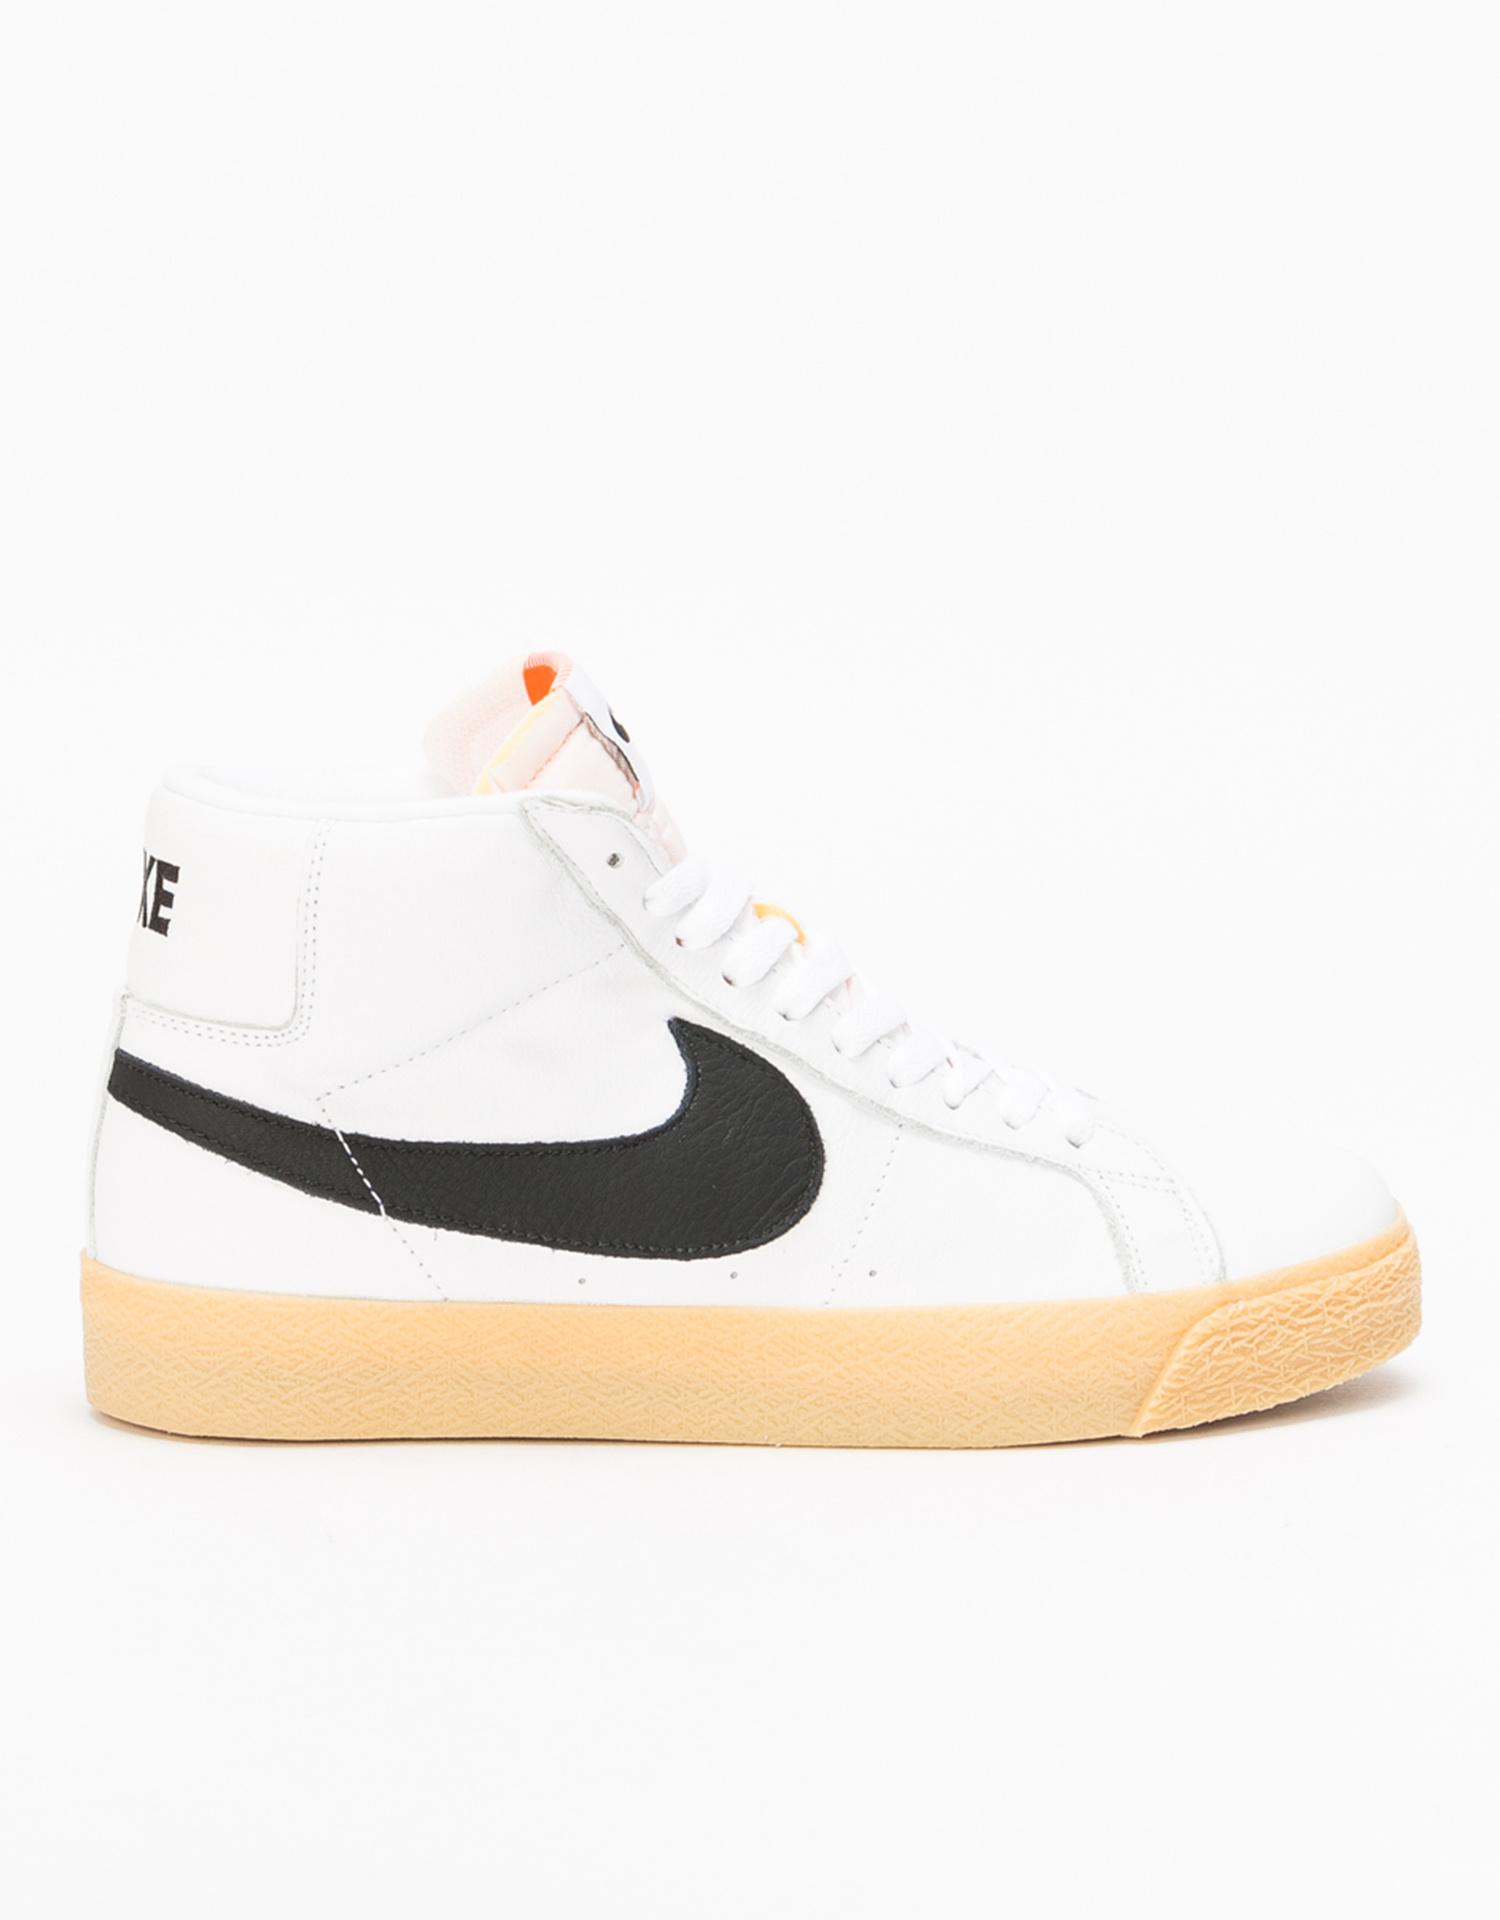 Nike SB Zoom Blazer Mid ISO Orange Label white/black-safety orange